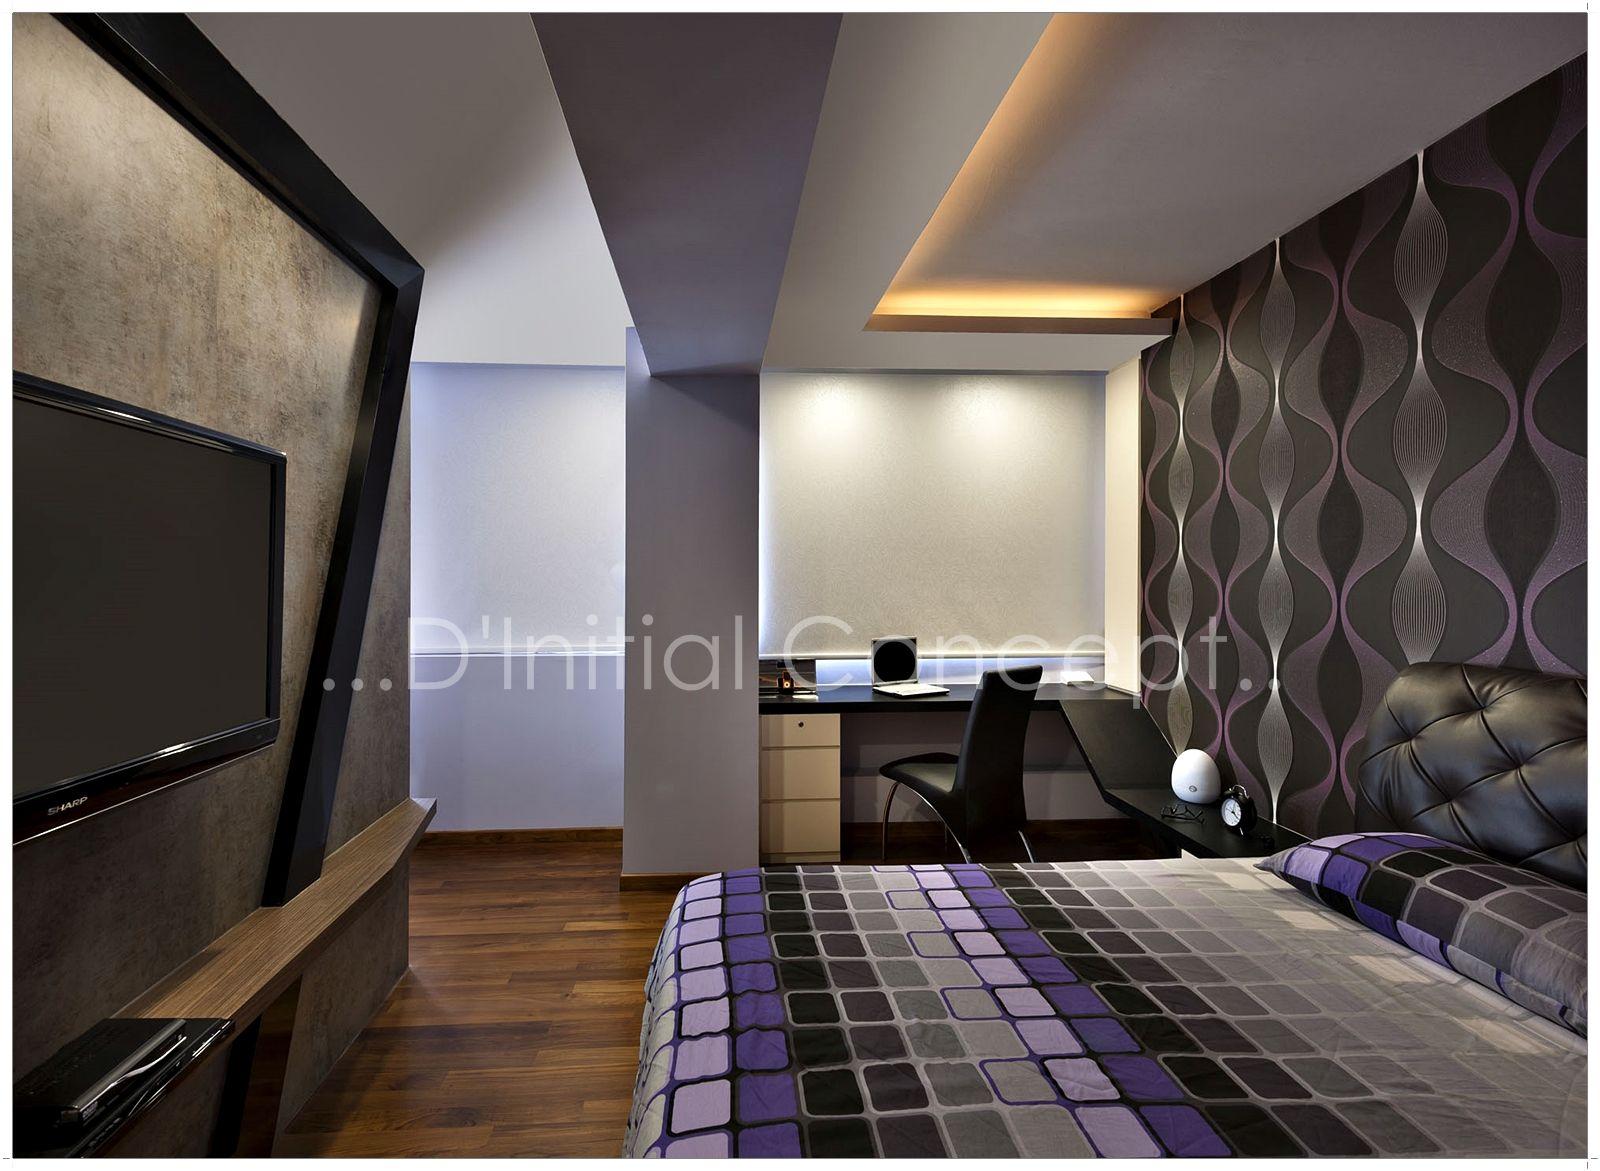 Master bedroom hdb  Du Initial Concept Interior Design Firm dinitialconcept on Pinterest